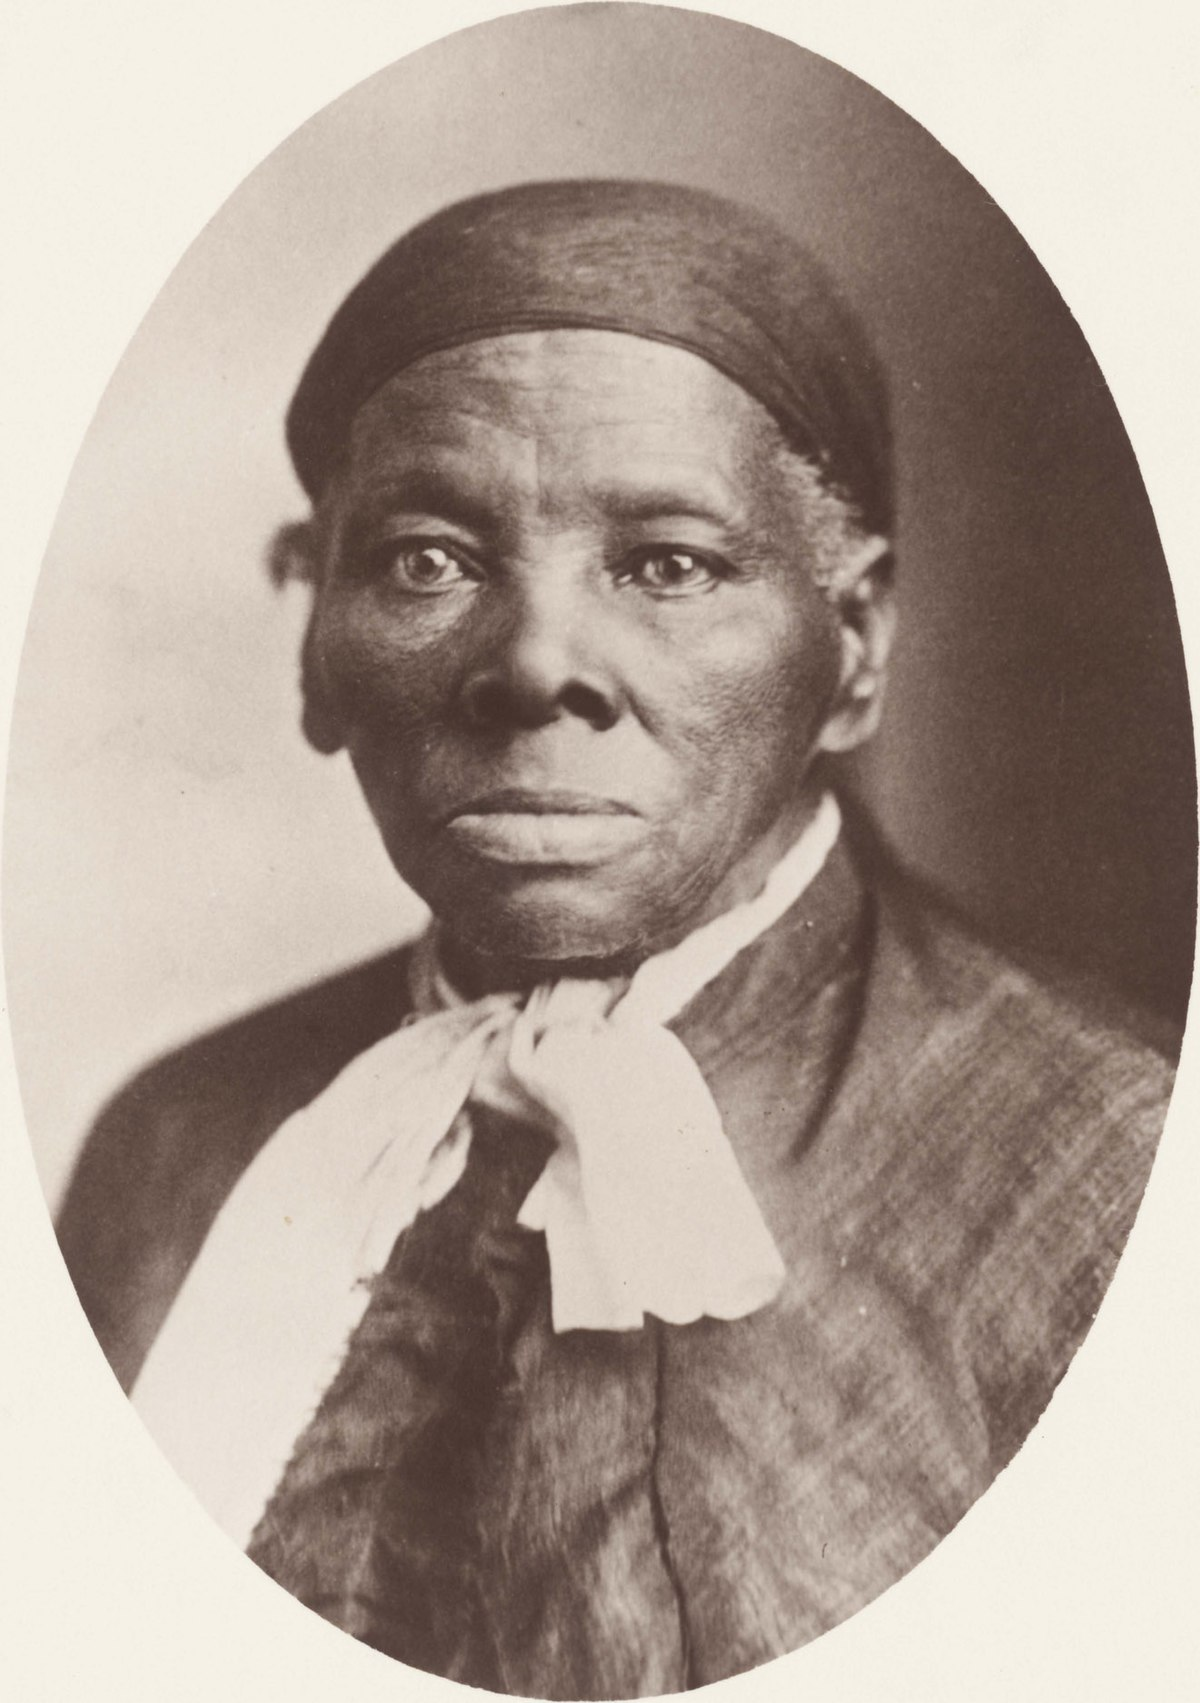 Close-up portrait photo of Tubman